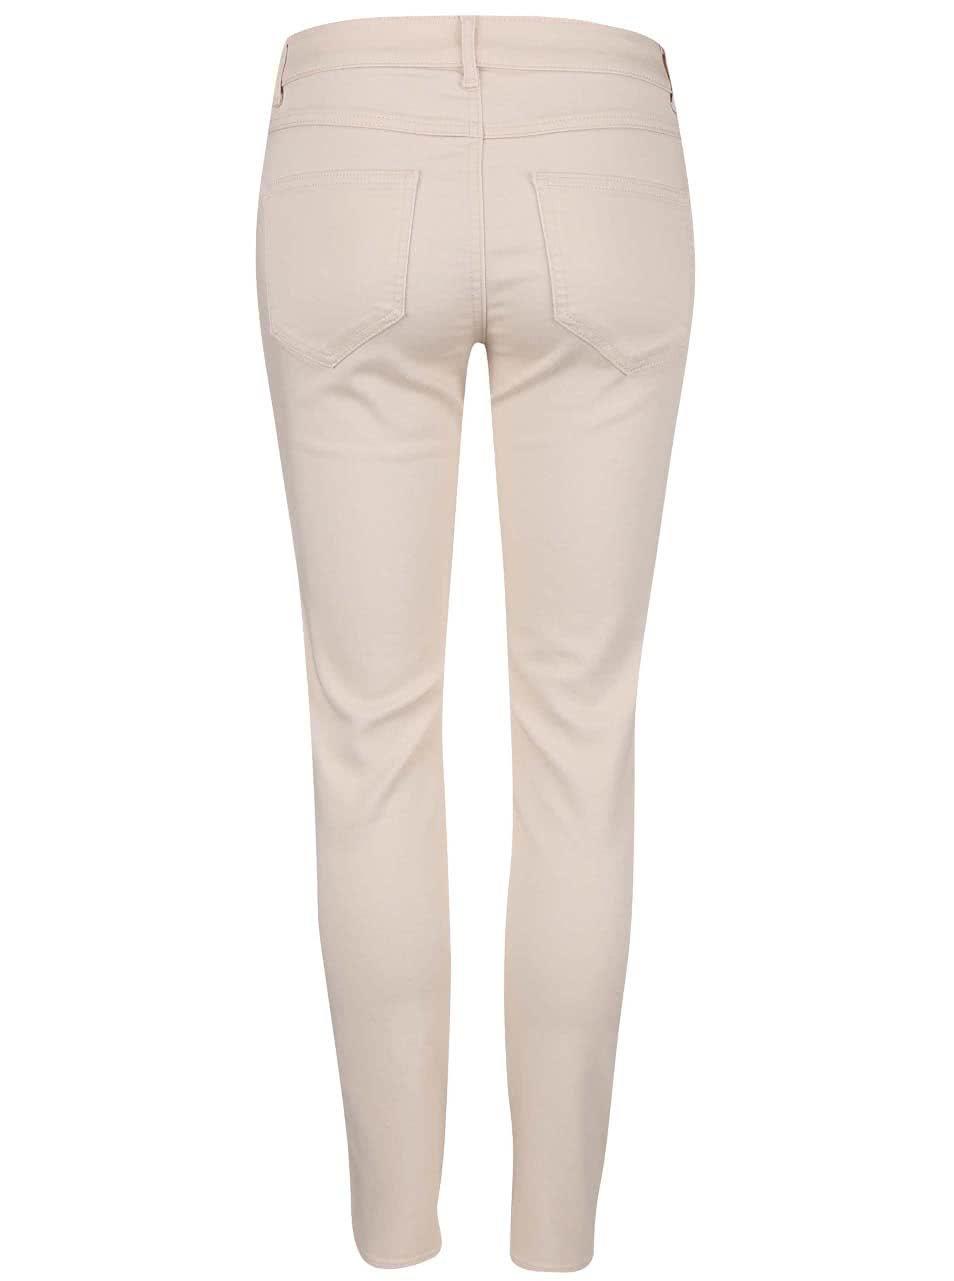 Krémovorůžové úzké kalhoty VILA Commit ... fdb716b1bb